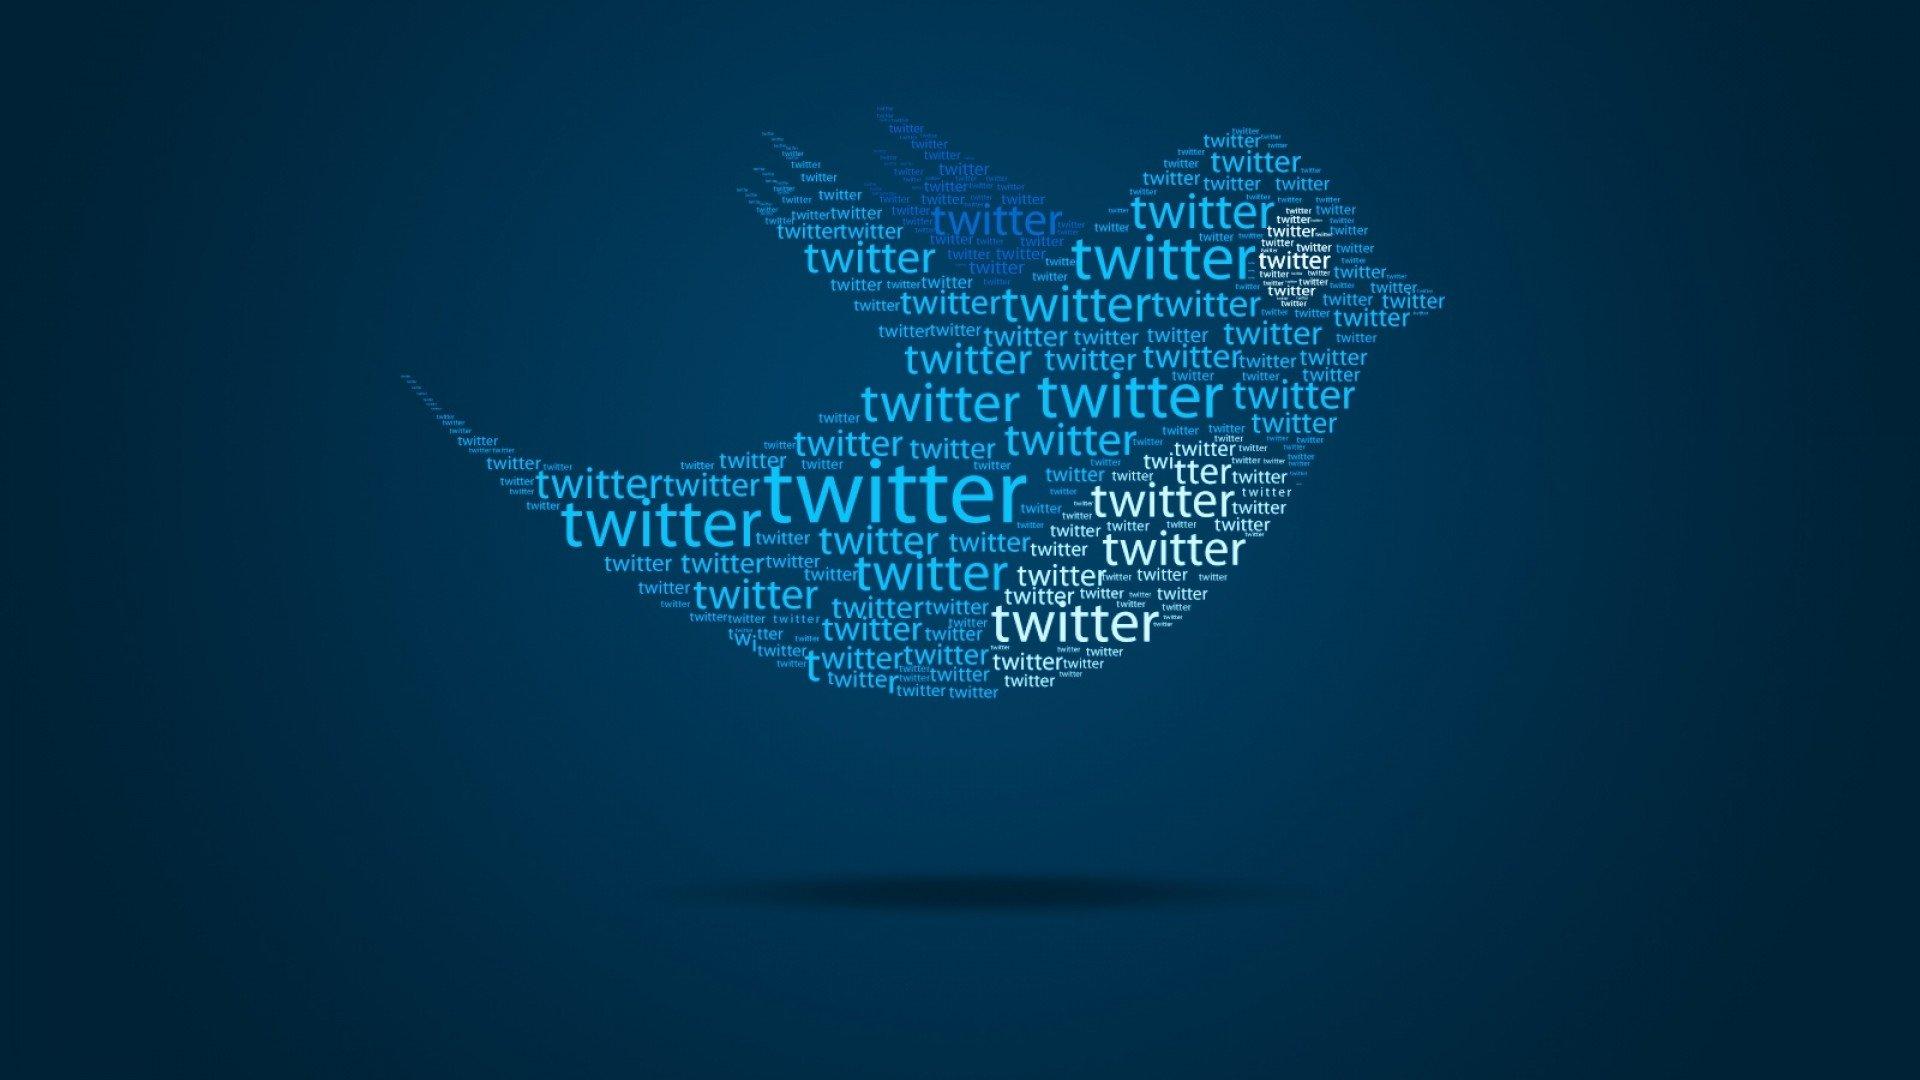 Wonderful Twitter Wallpaper